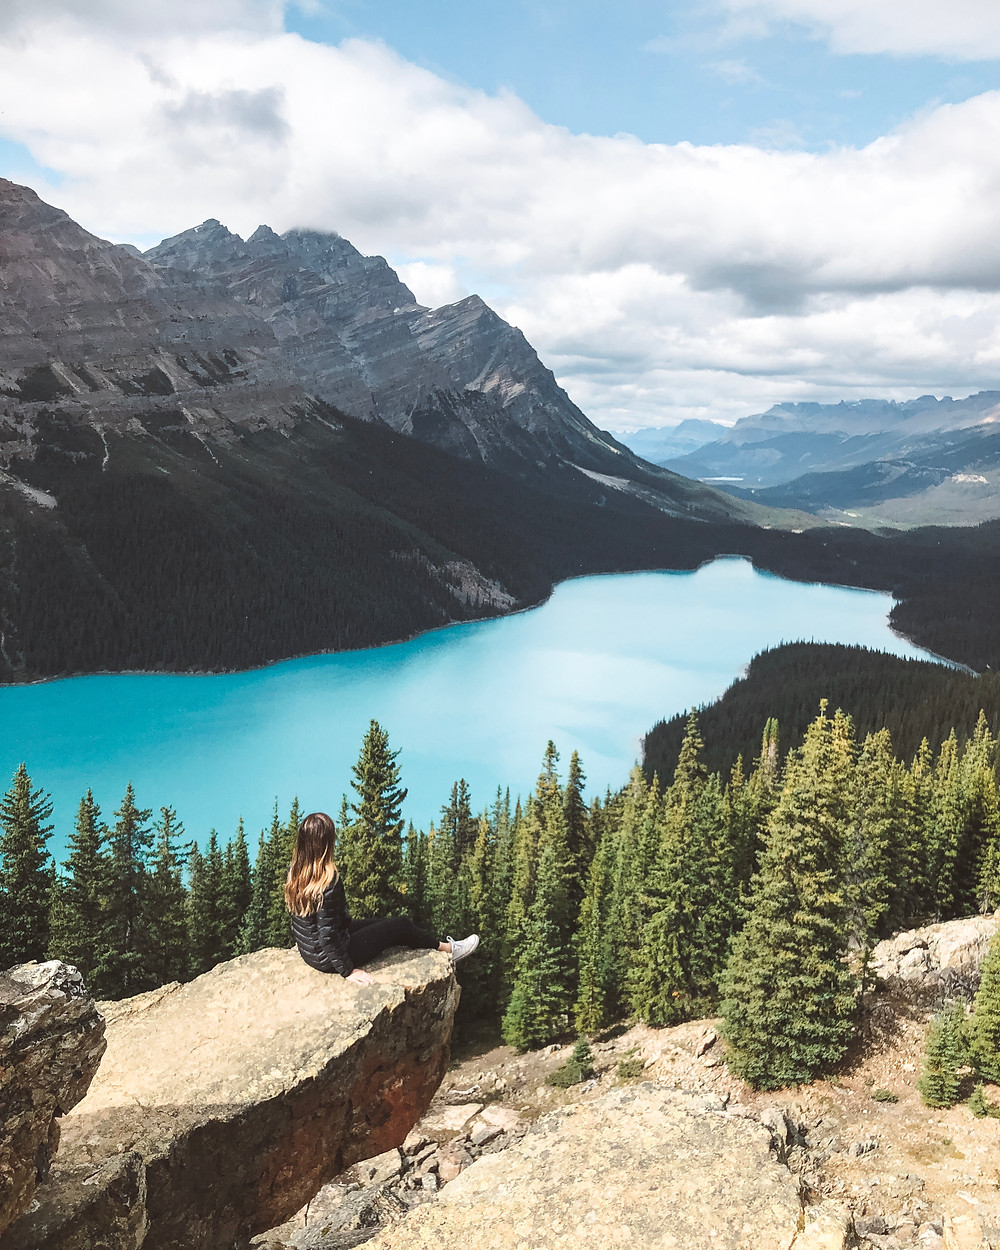 peyto lake secret rock turquoise blue lake forest alberta canada